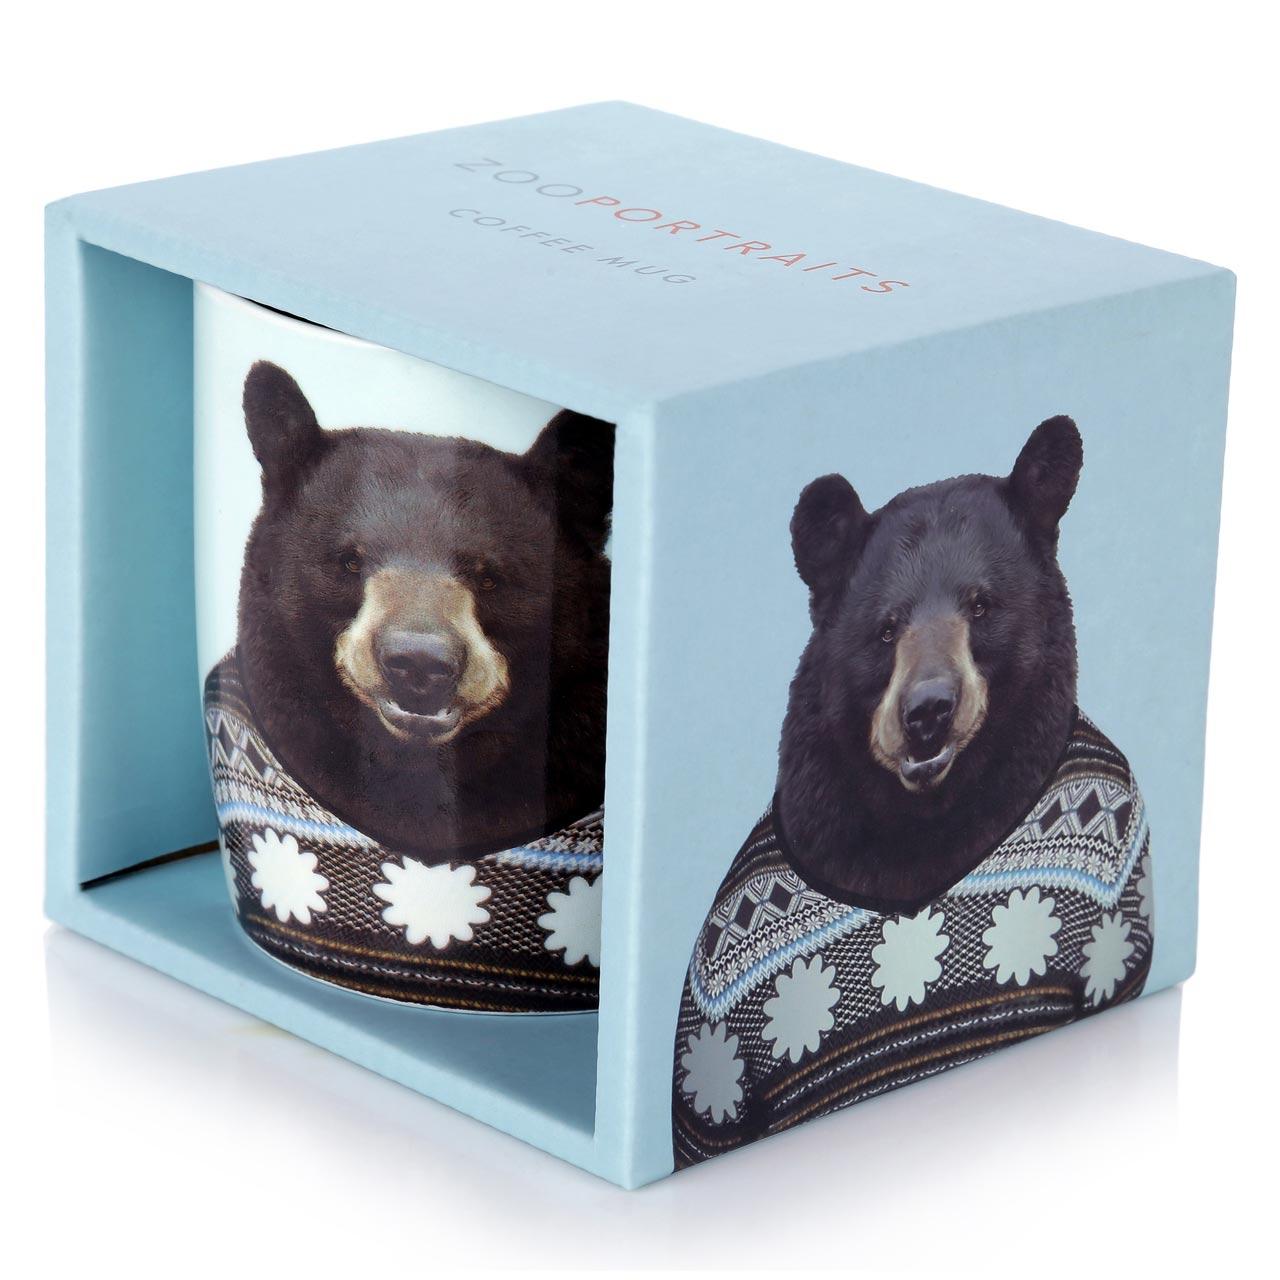 Porcelain Mug Bear gift box | The Design Gift Shop